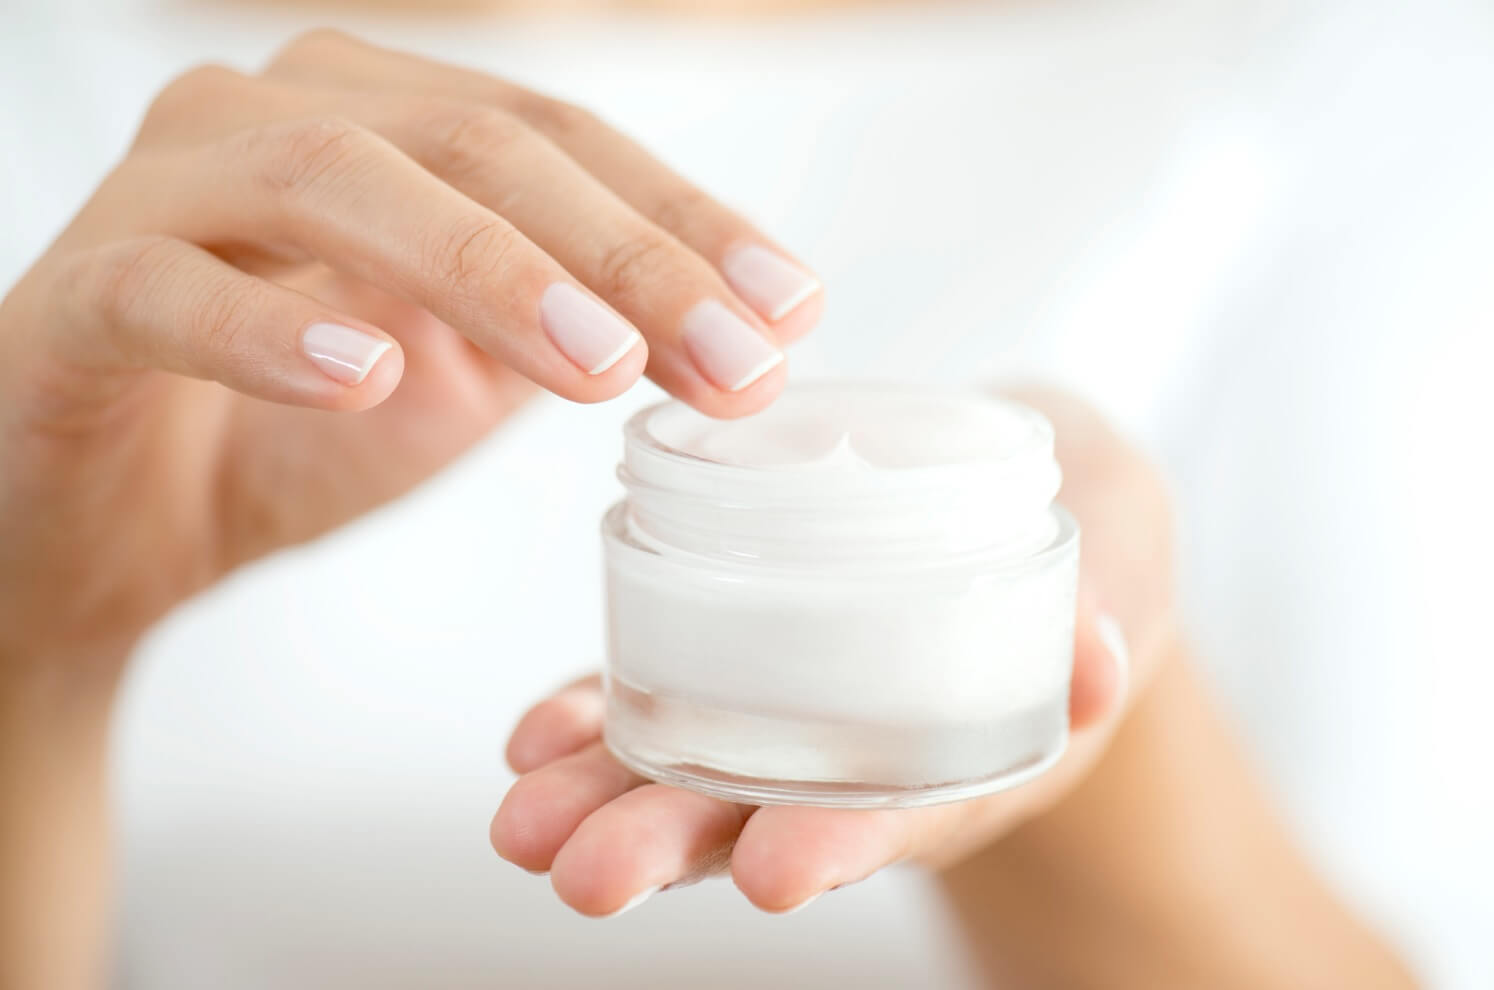 mejor crema antiarrugas mujer 60